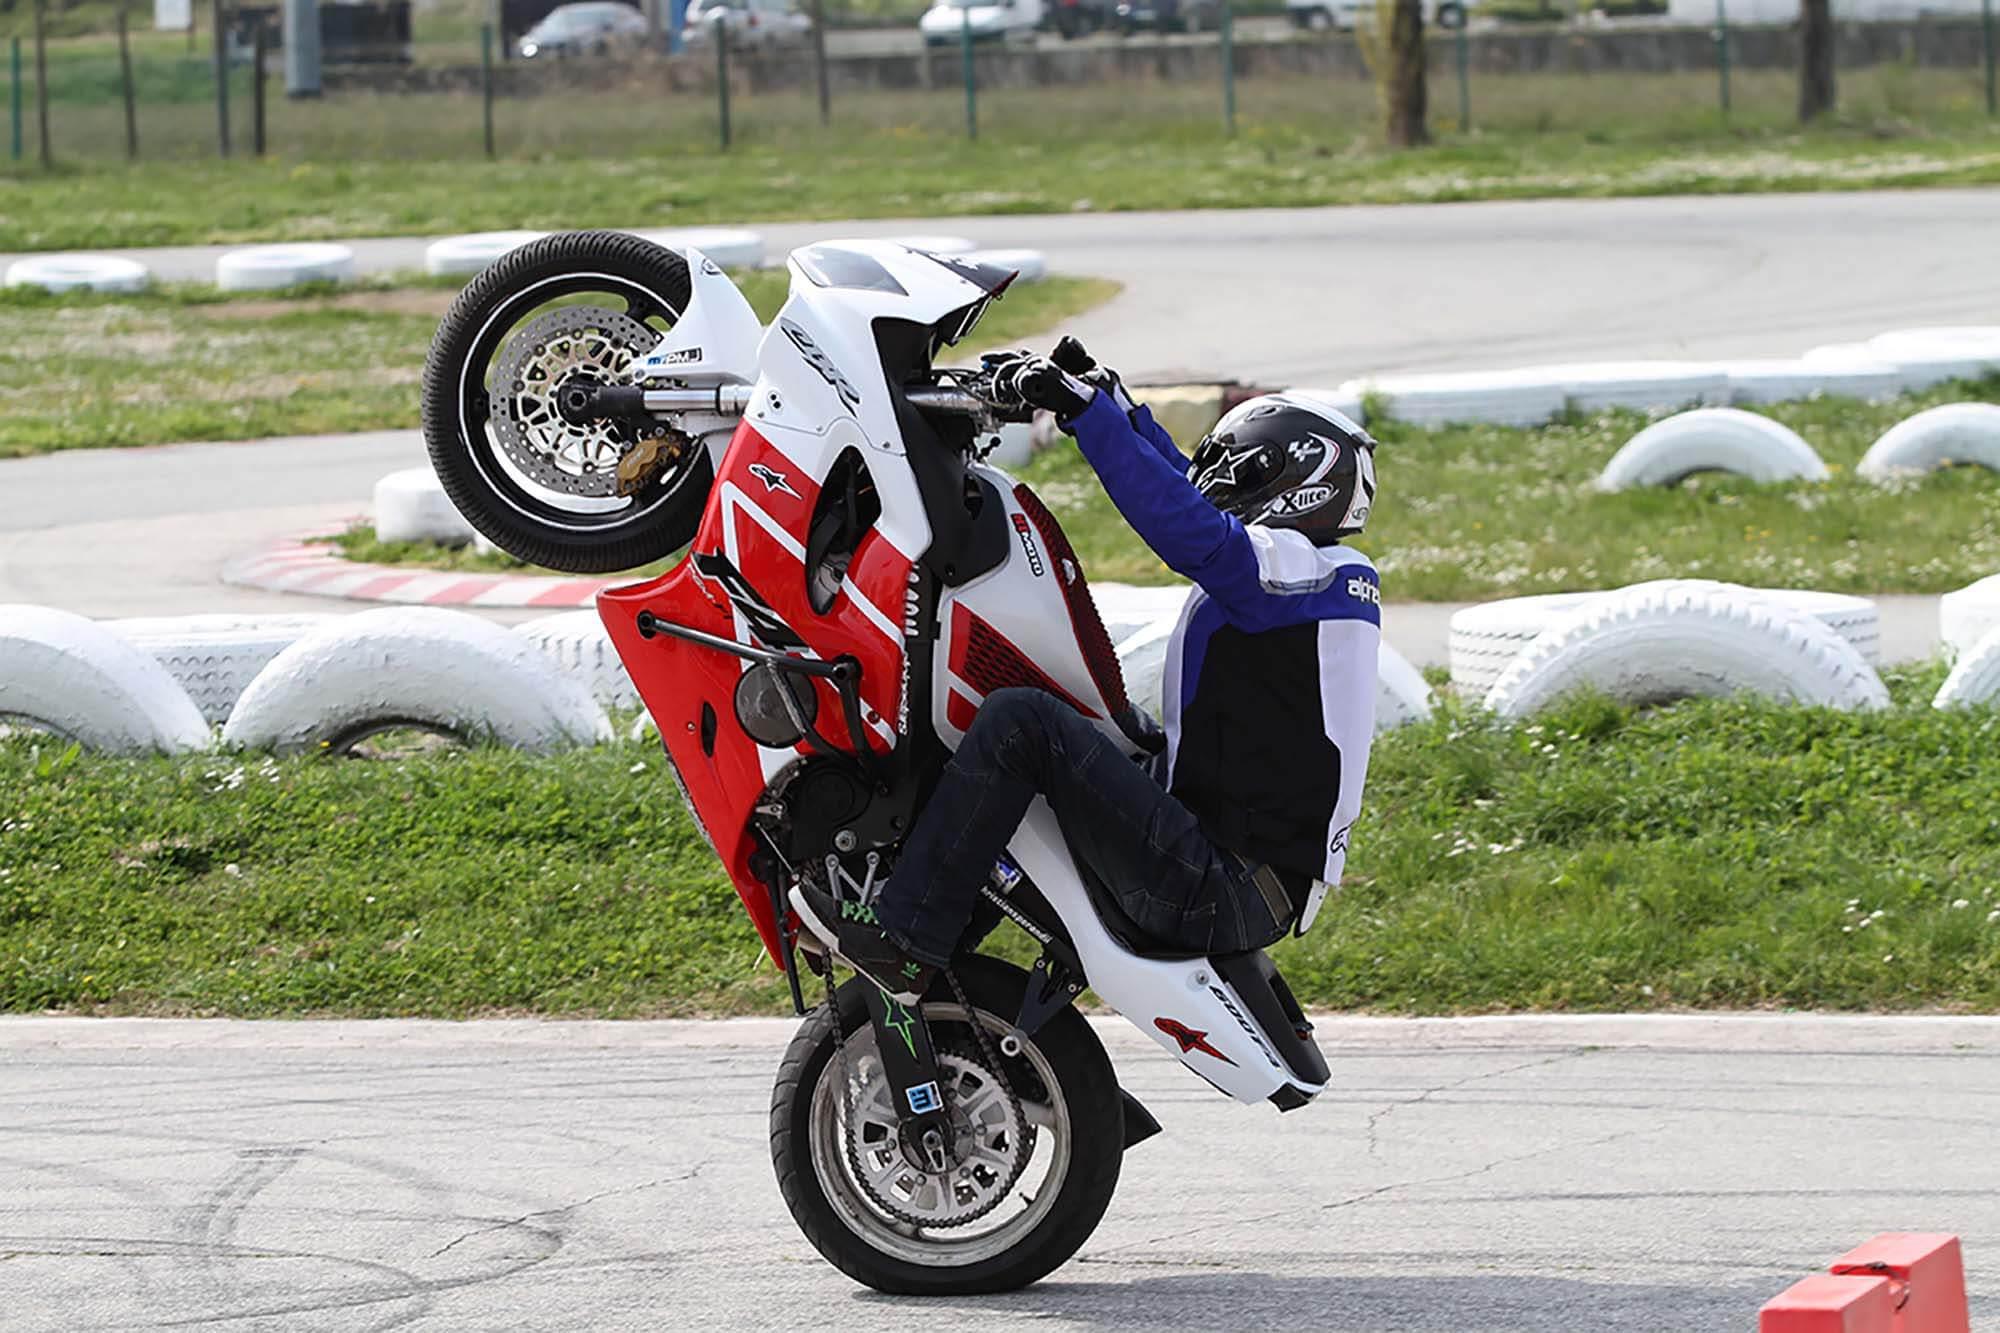 Impennare in moto